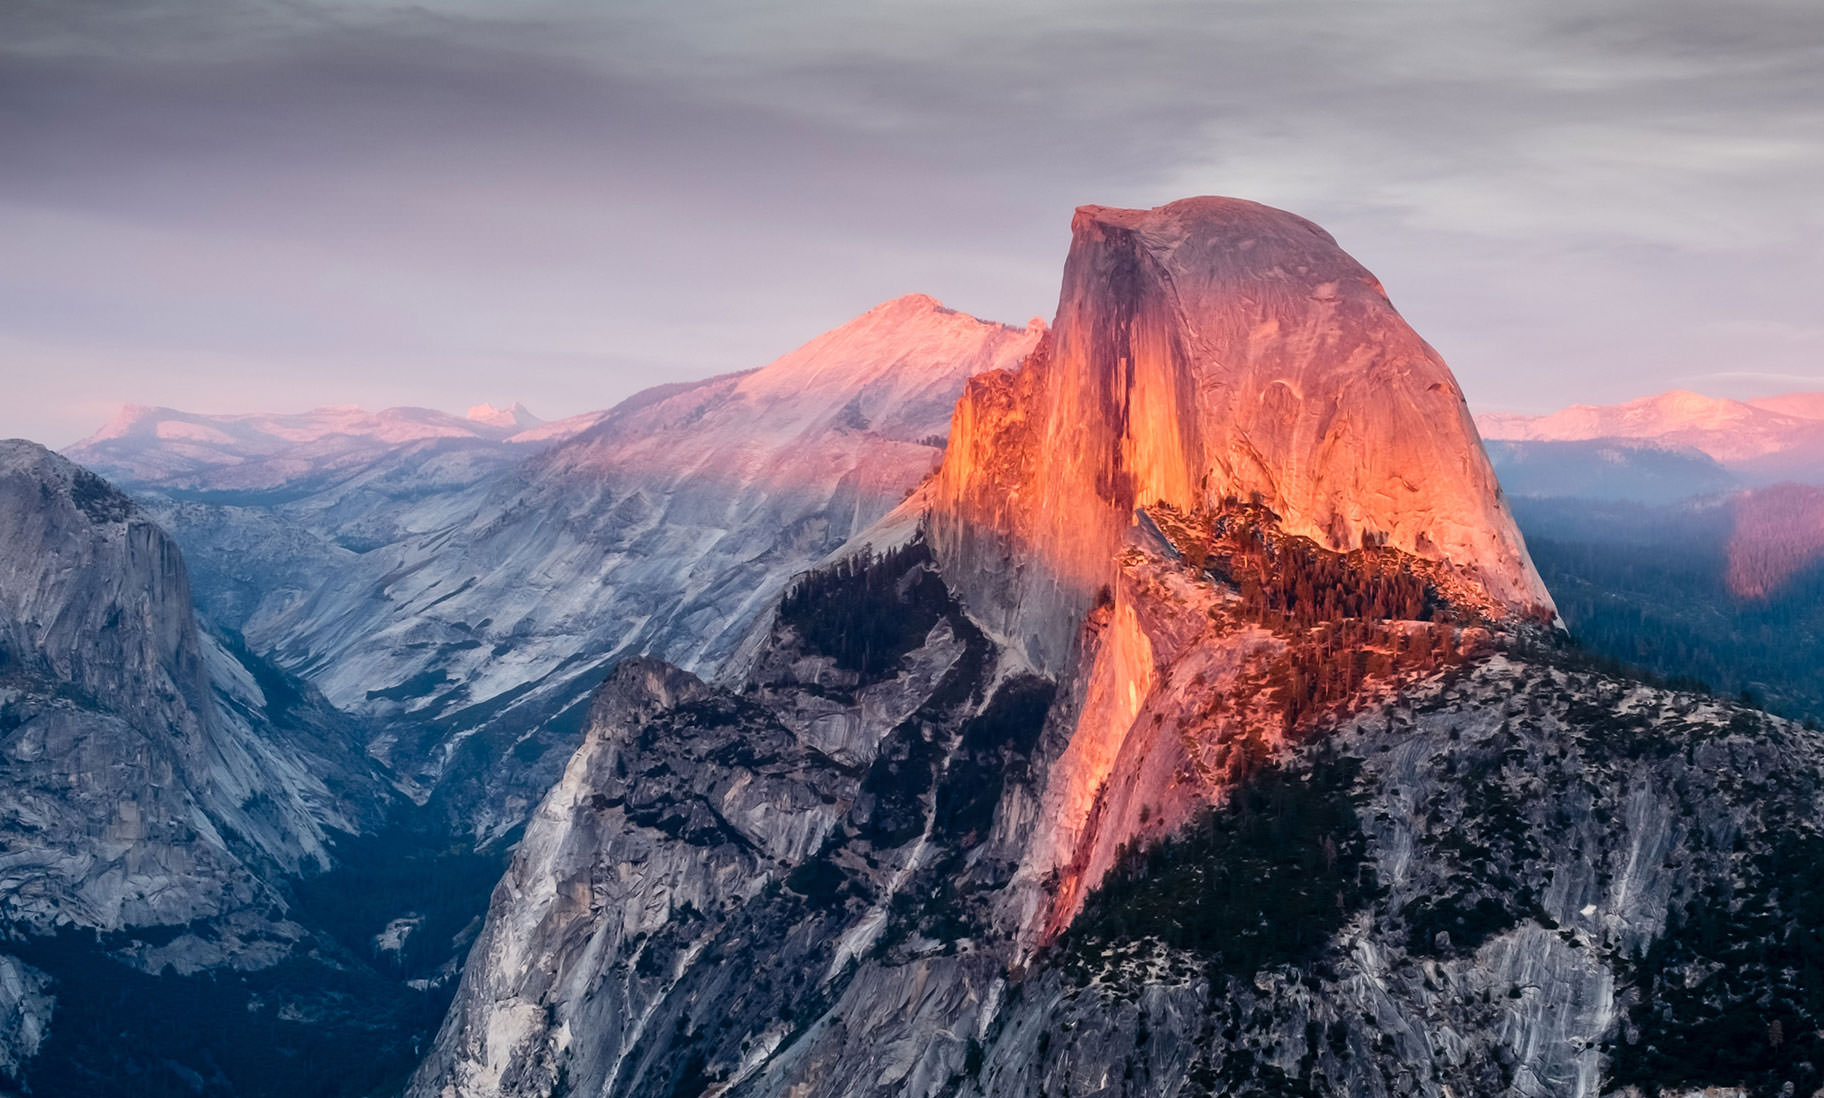 Glacier Point - Yosemite National Park, CAImage by Madhu Shesharam @ www.instagram.com/madhucs